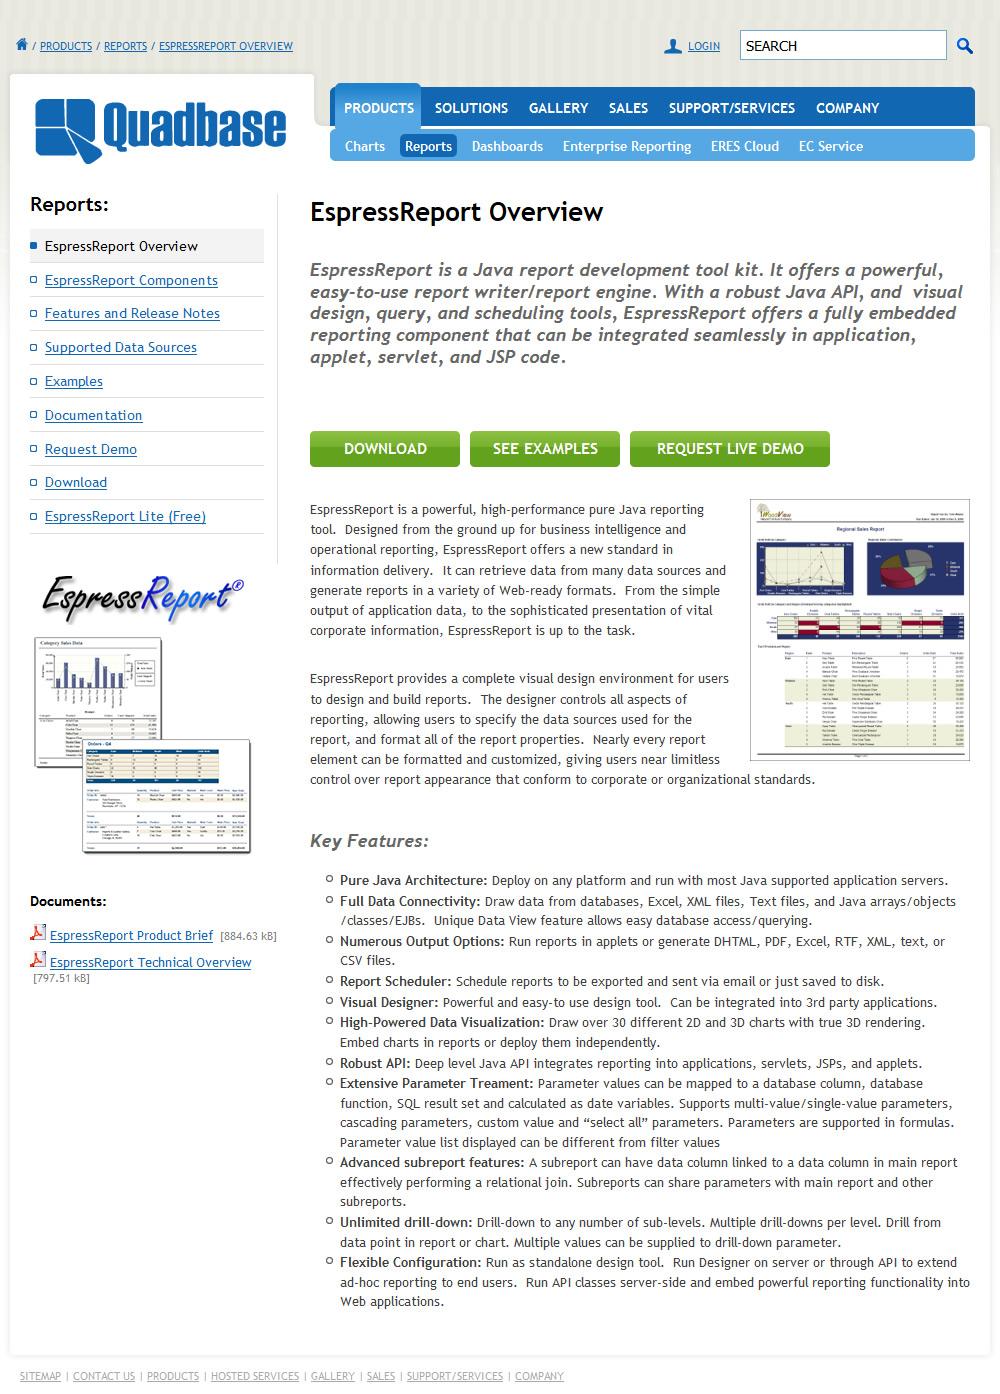 Quadbase Systems Inc.